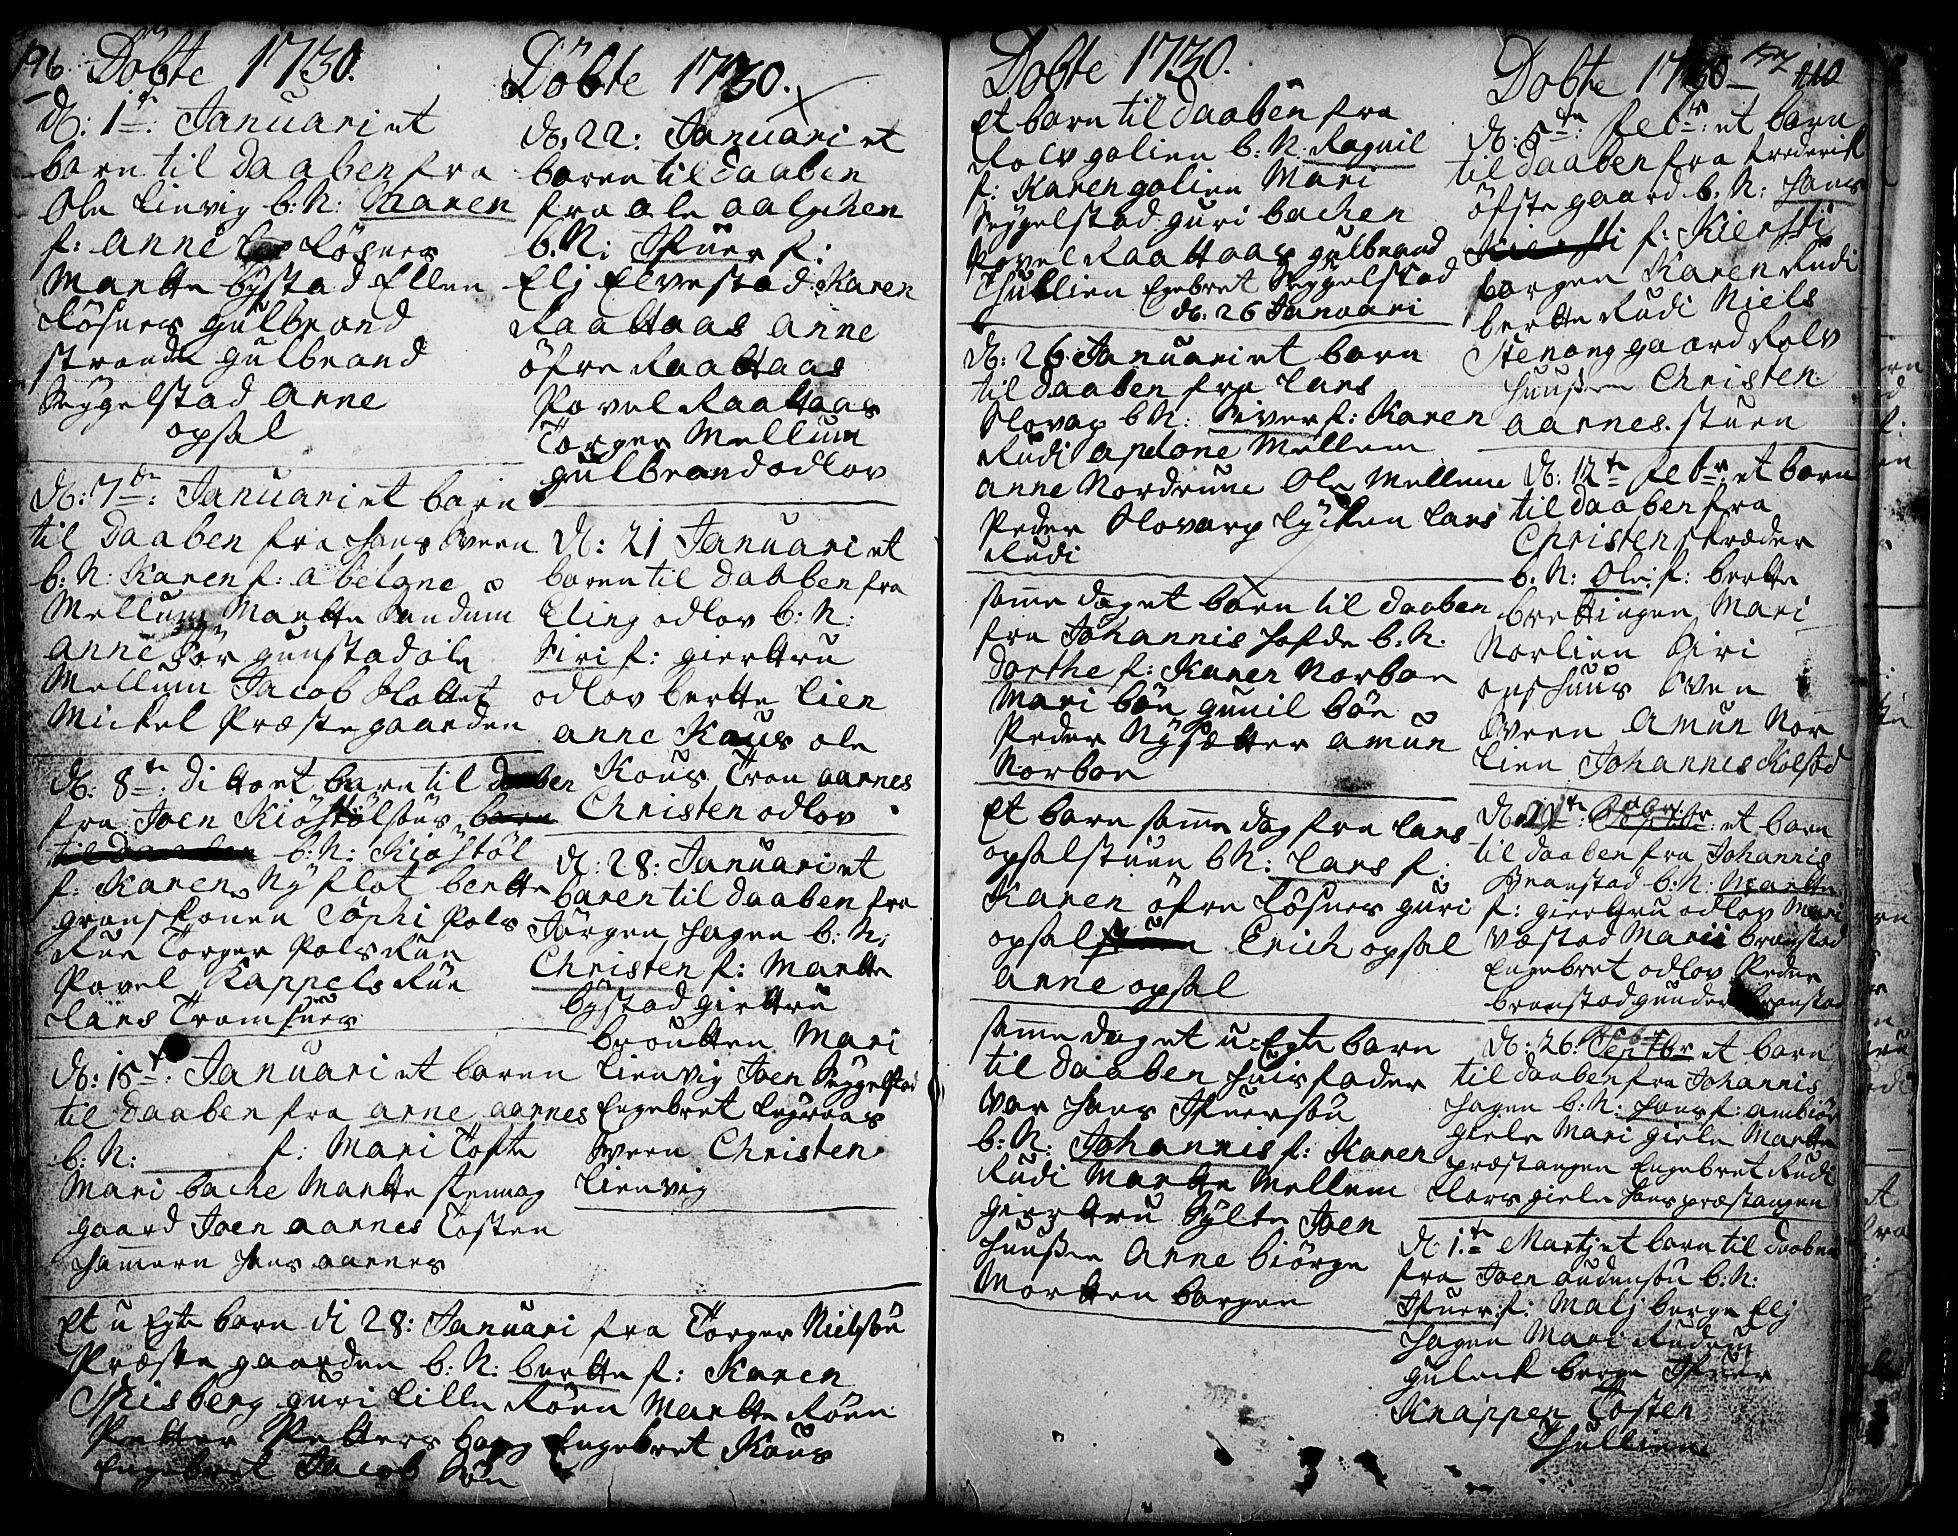 SAH, Ringebu prestekontor, Ministerialbok nr. 1, 1696-1733, s. 196-197